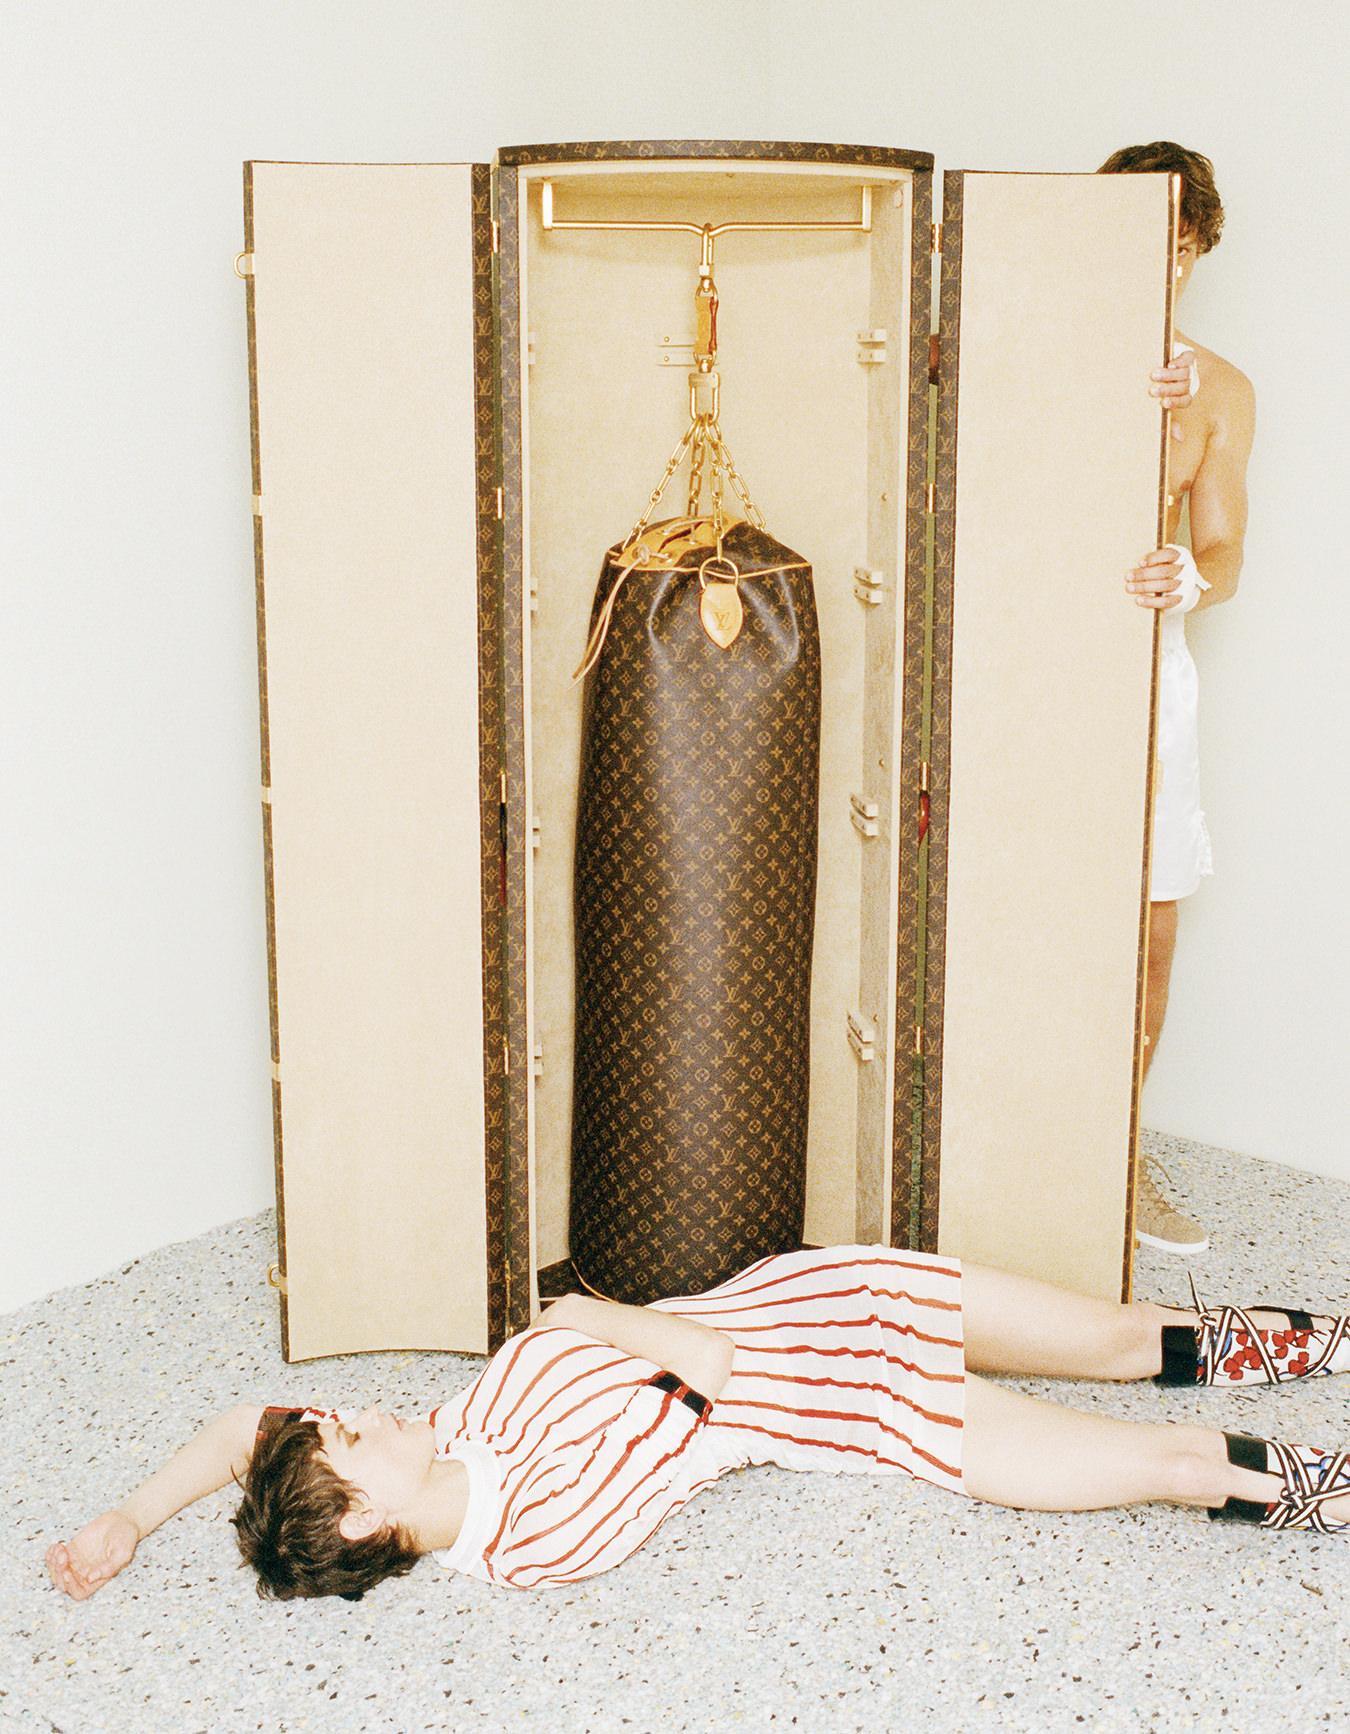 NUVO Magazine Winter 2014: Inquiring Minds, Louis Vuitton